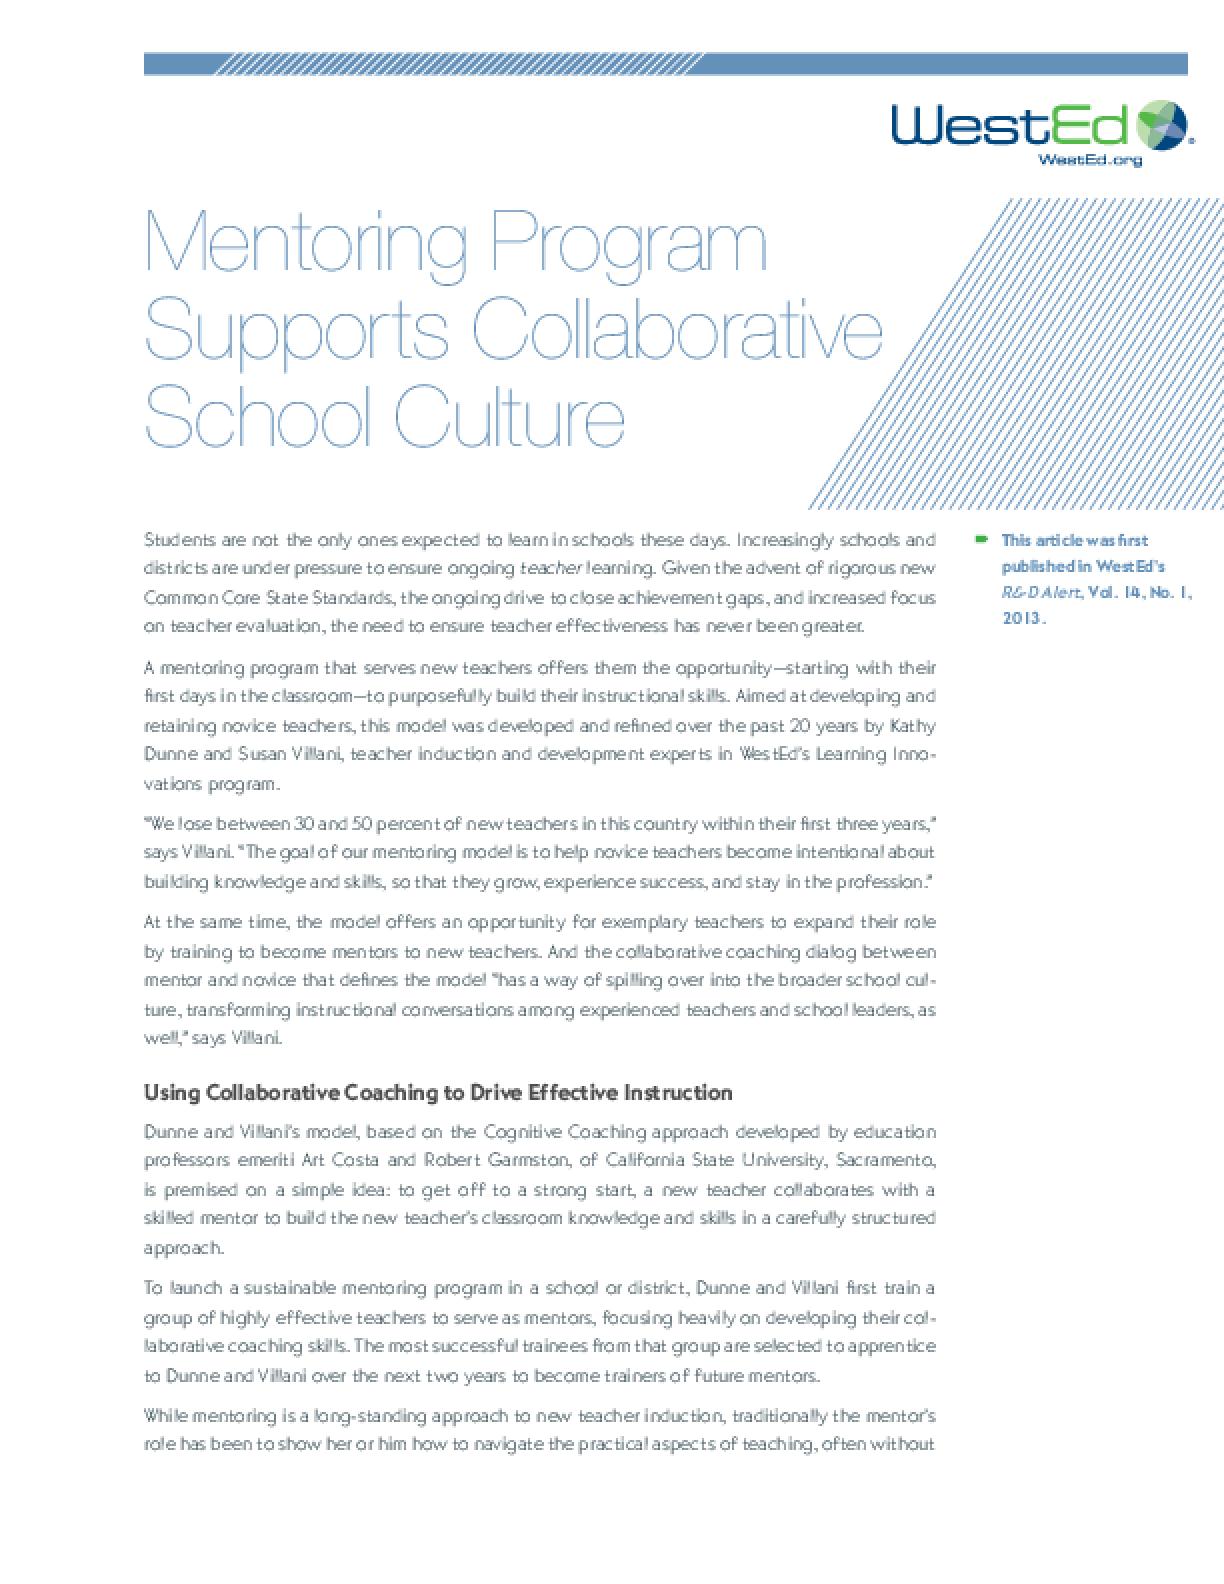 Mentoring Program Supports Collaborative School Culture